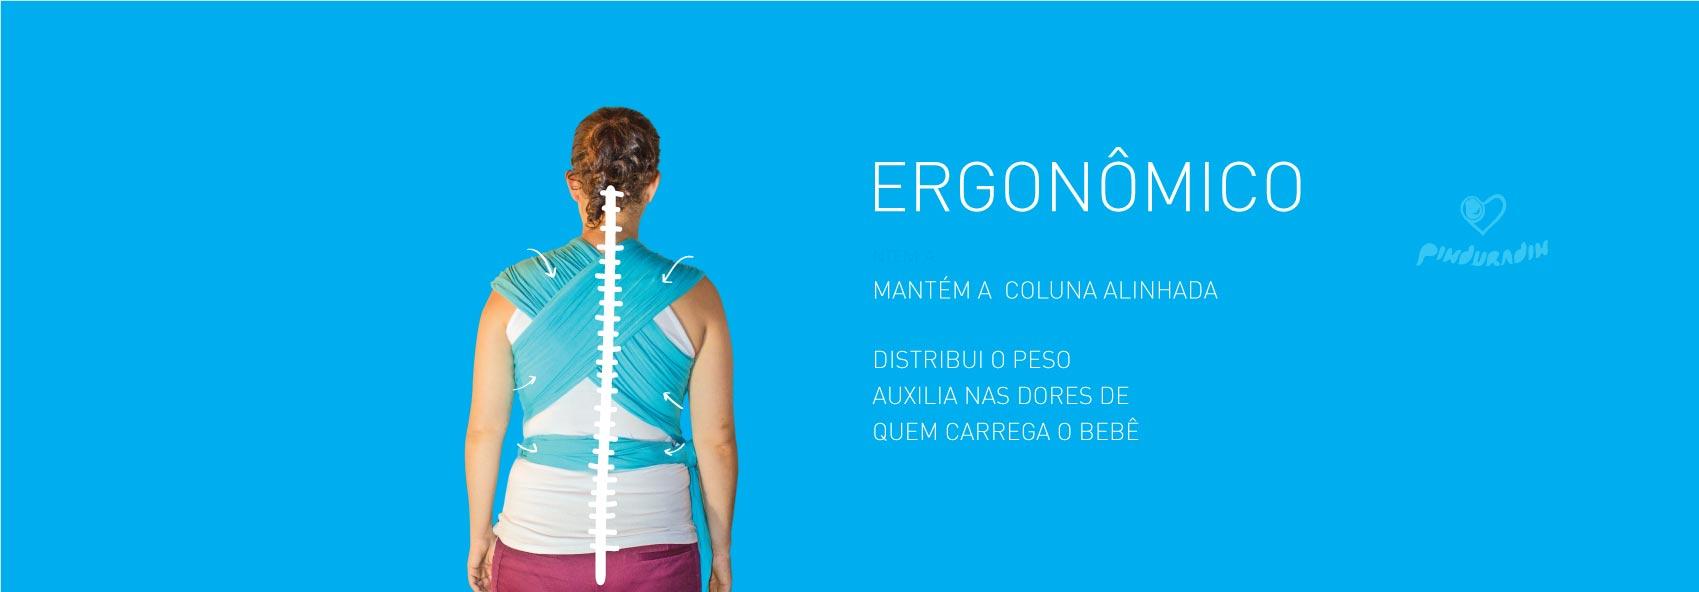 ergonomico2.jpg